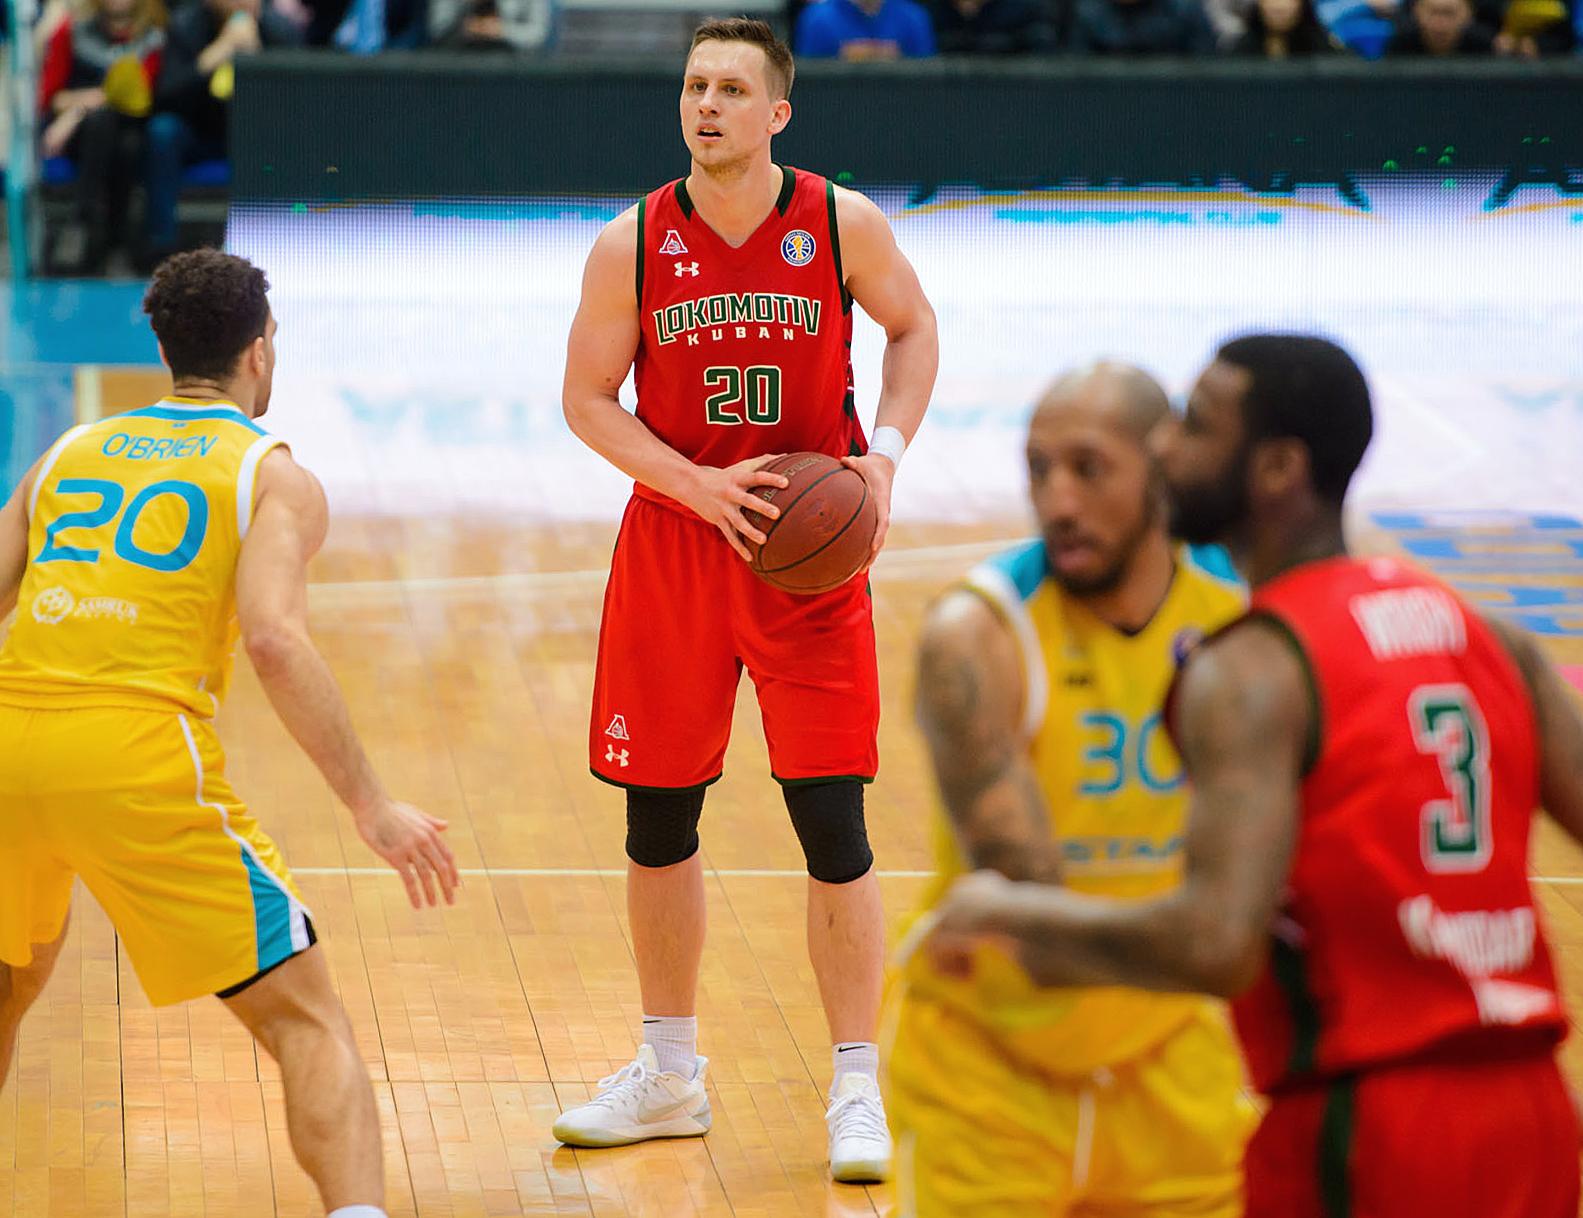 Loko Keeps Astana From 4th Place